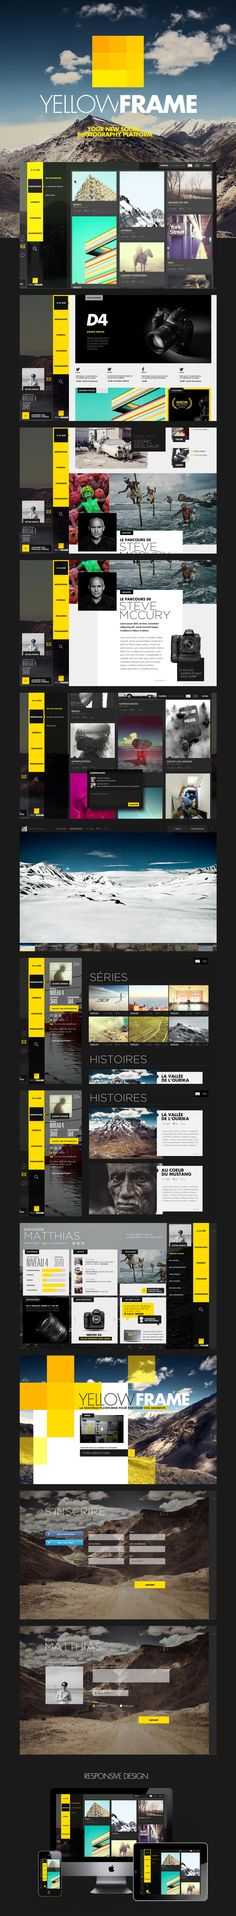 Yellow Frame // web design